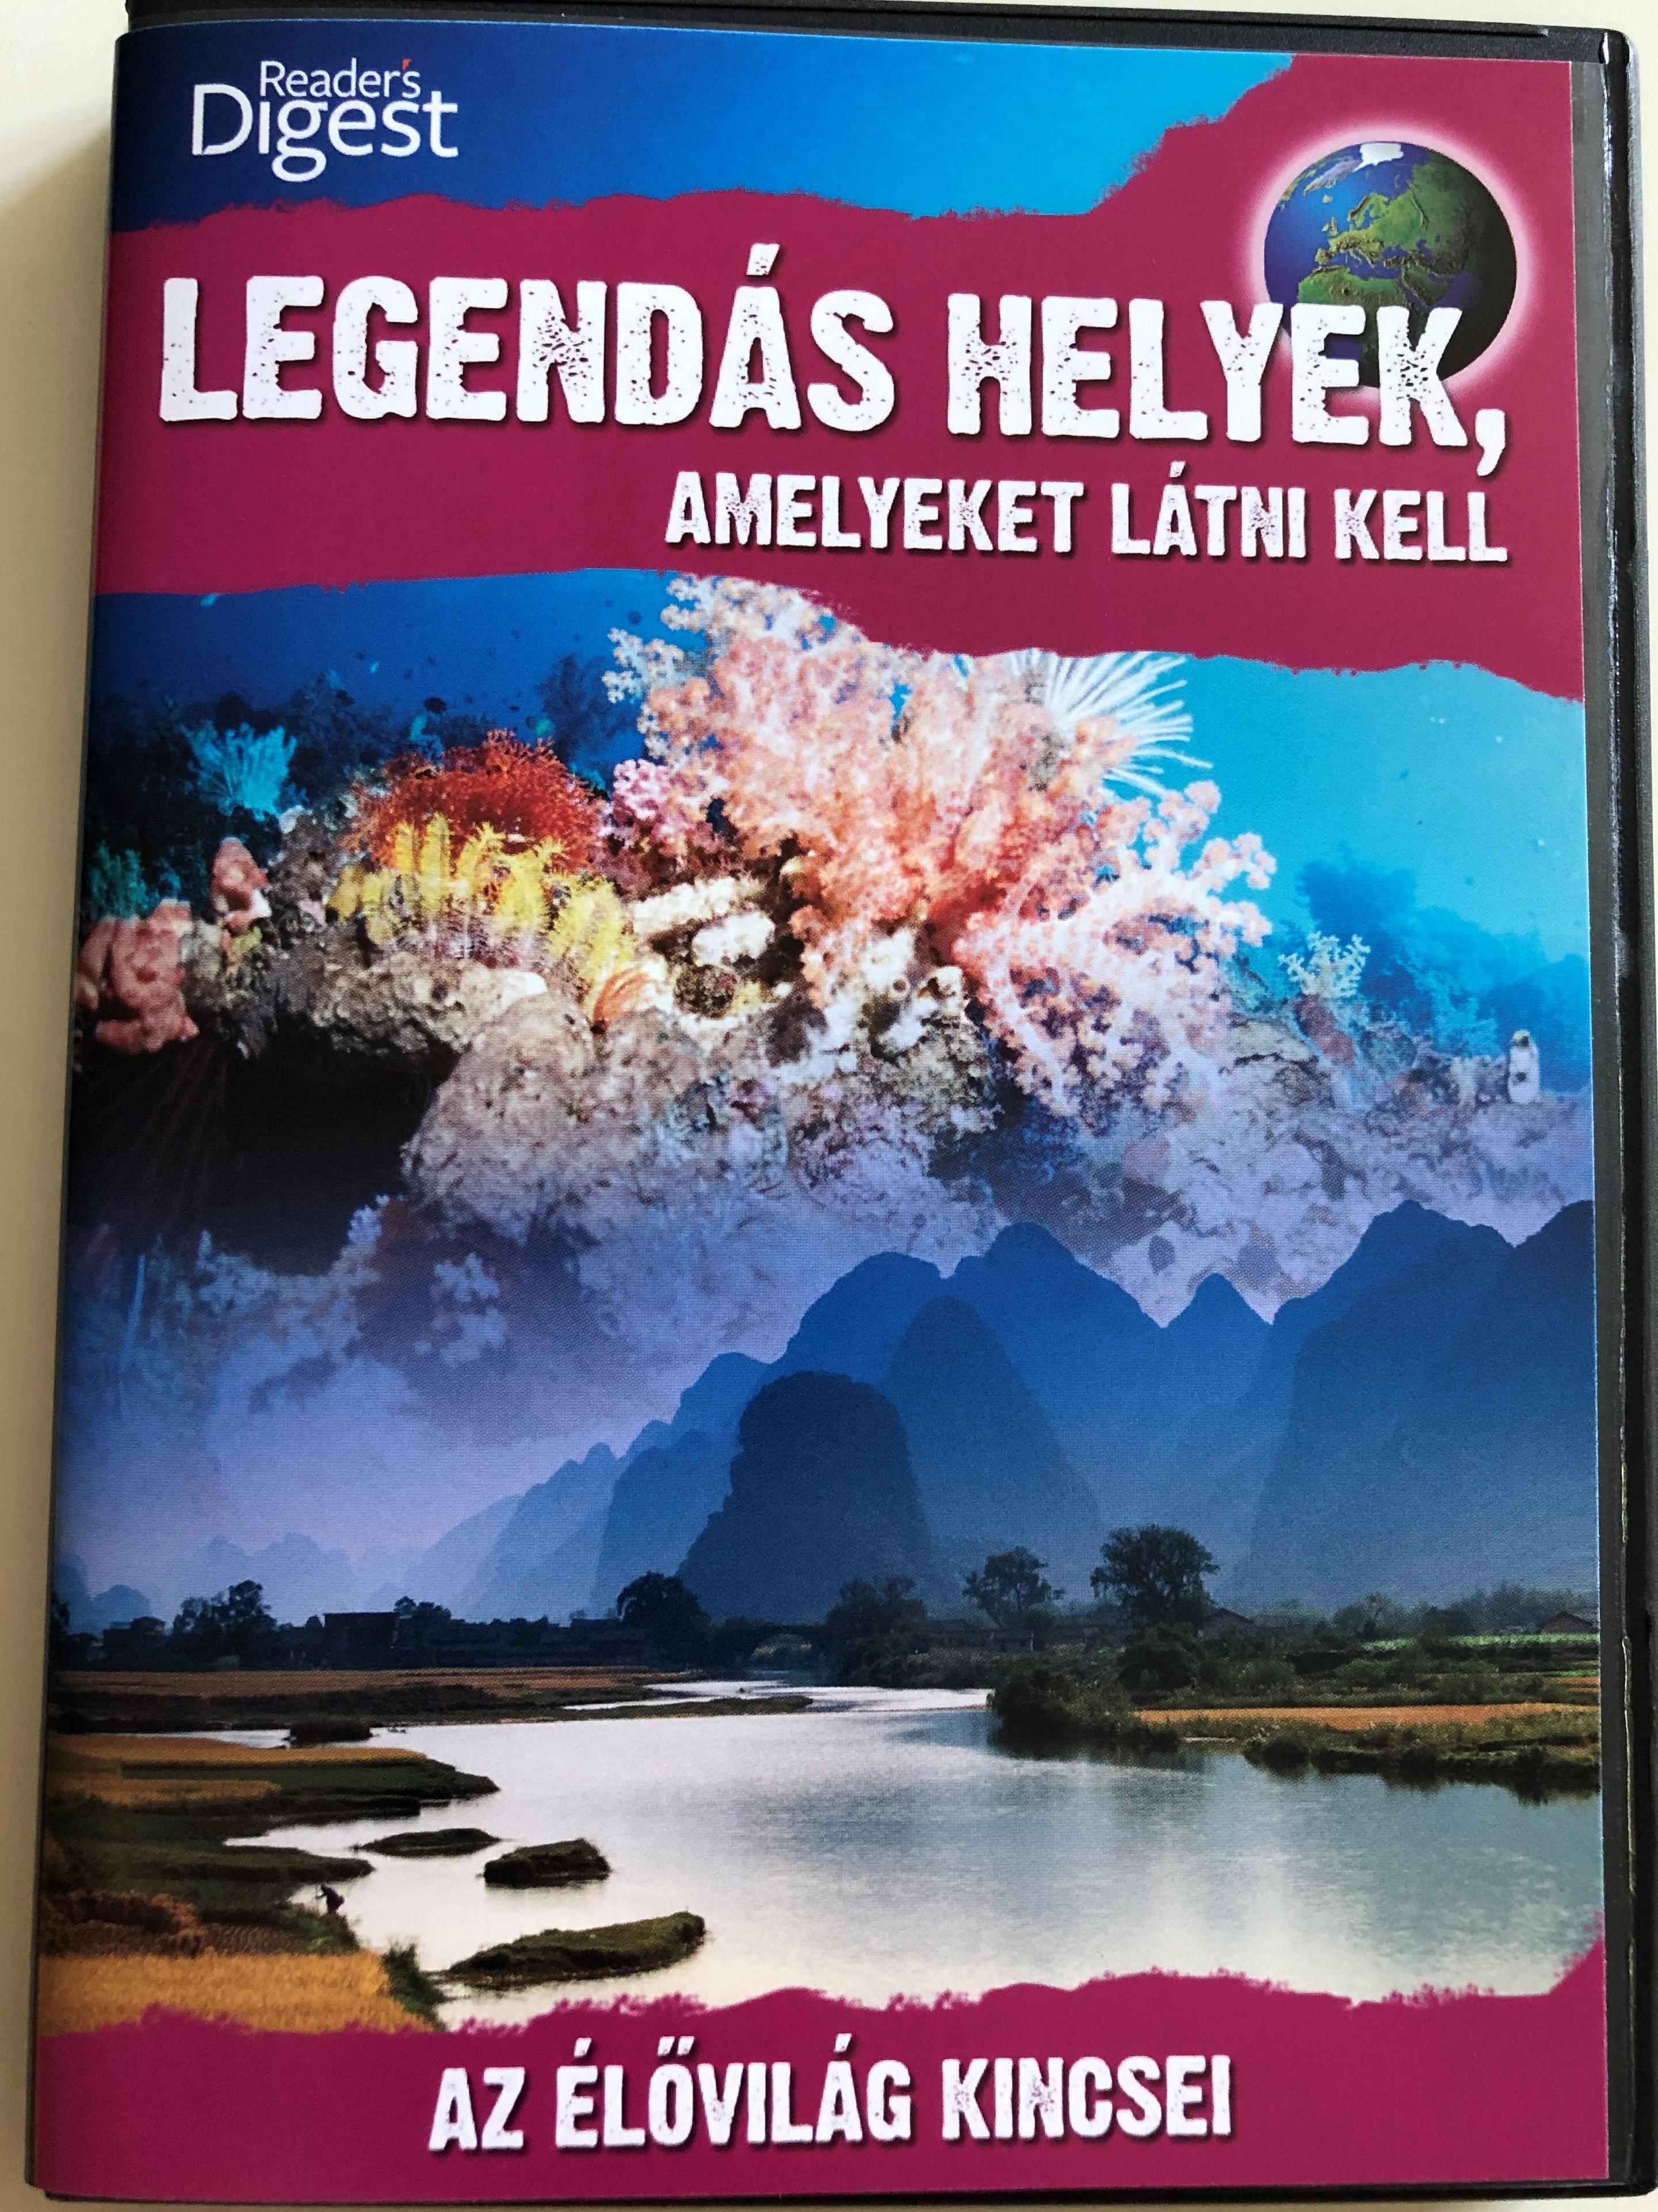 legendary-locations-treasures-dvd-2009-legend-s-helyek-amelyeket-l-tni-kell-az-l-vil-g-kincsei-reader-s-digest-narrated-by-josh-gates-1-.jpg